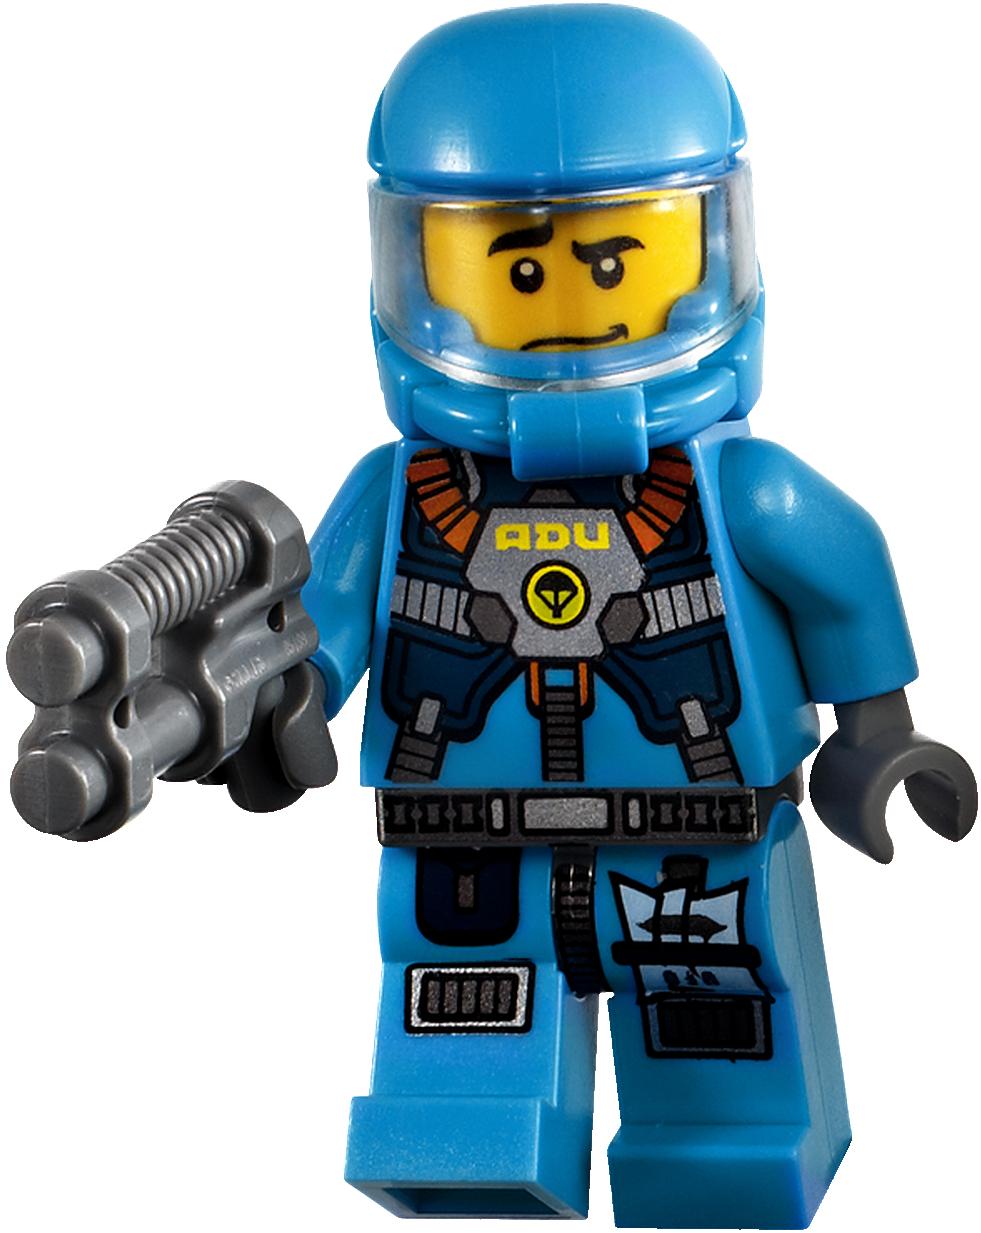 Lego clipart lego movie. Transparent background png mart